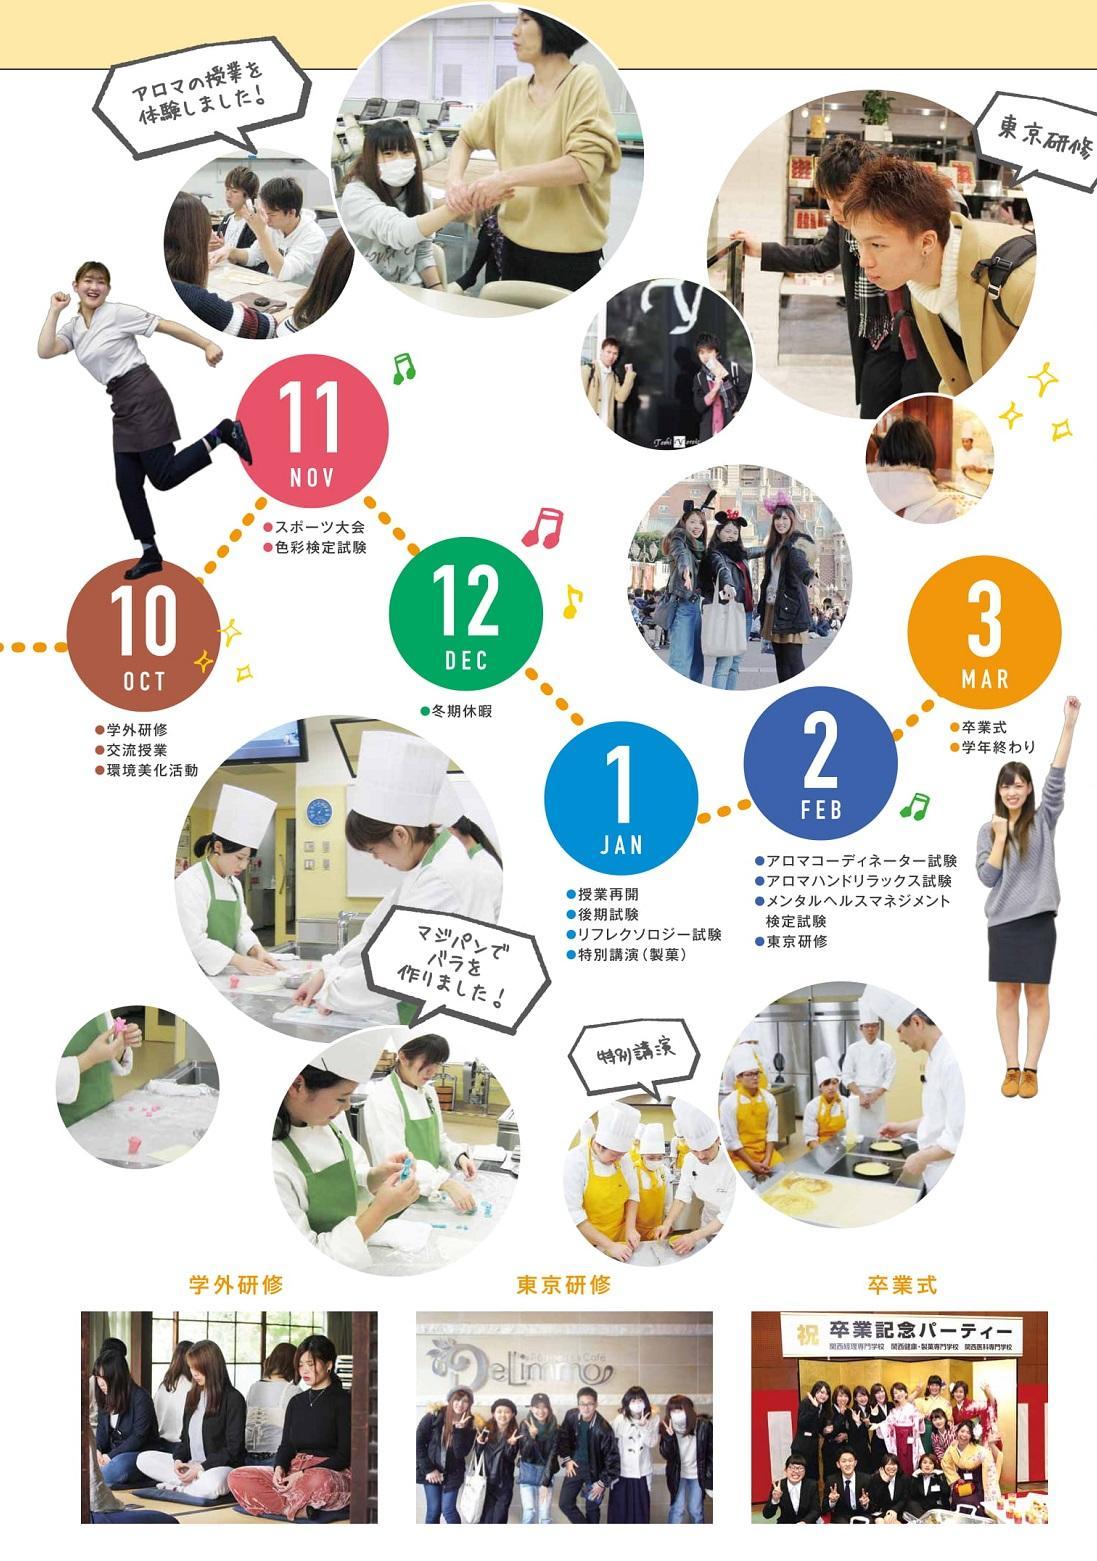 http://www.kwc.ast.ac.jp/kenko/cms/seika_2019_p30-1.jpg